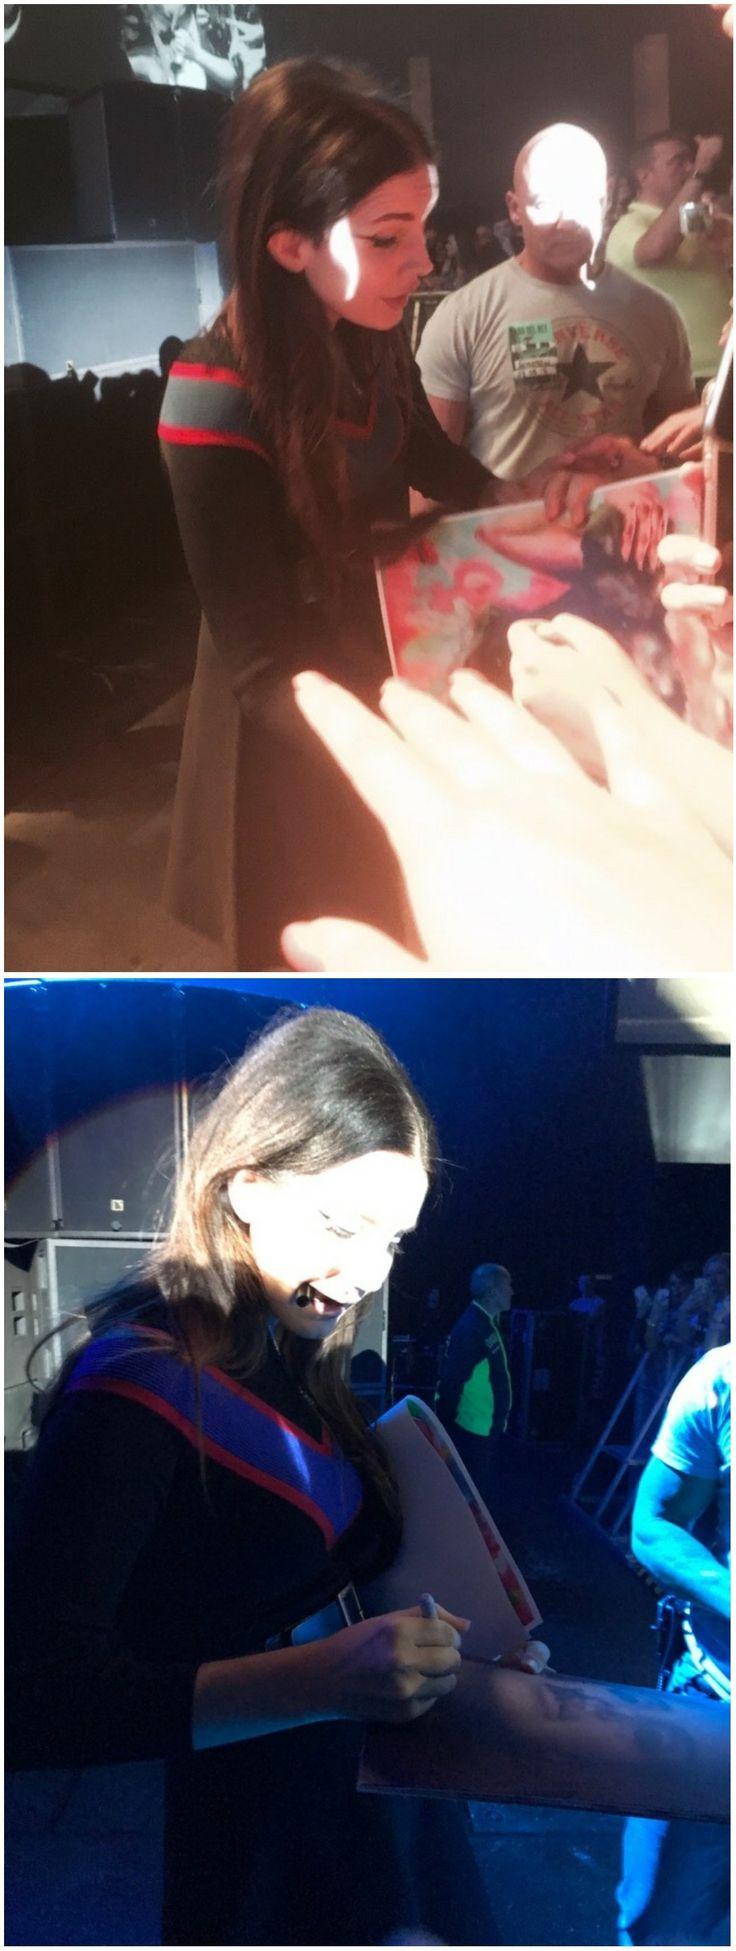 Aug.23, 2017: Lana Del Rey performing in Glasgow, Scotland #LDR